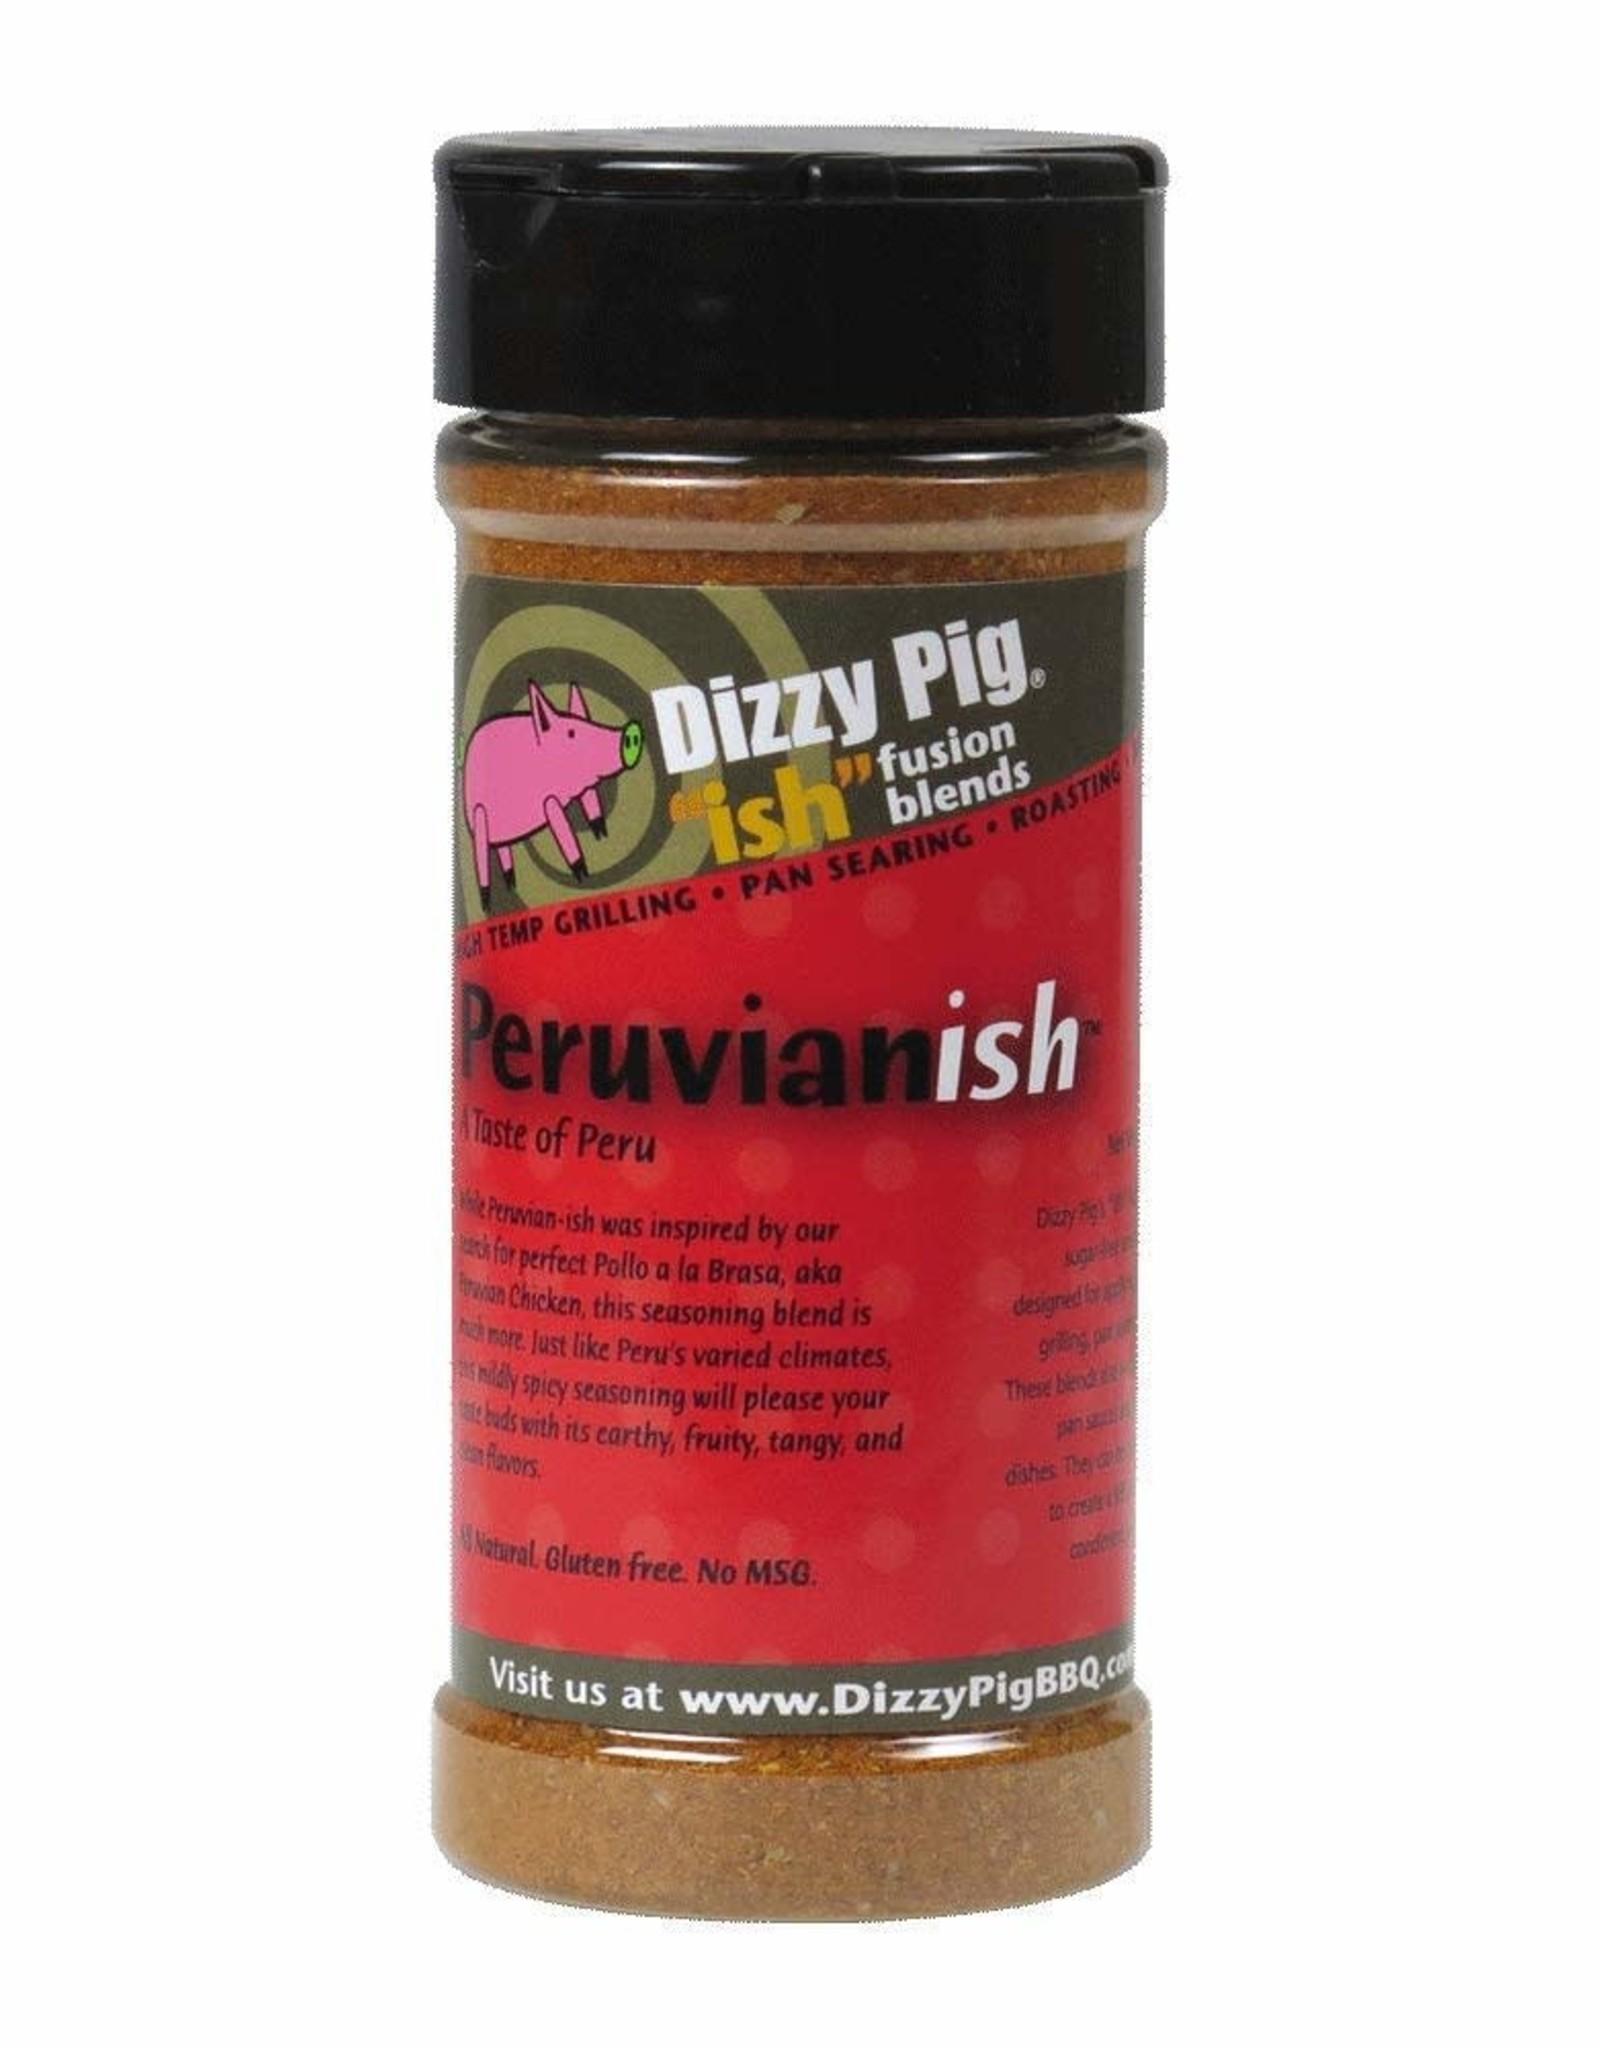 Dizzy Pig Dizzy Pig - Peruvian-ish 8oz